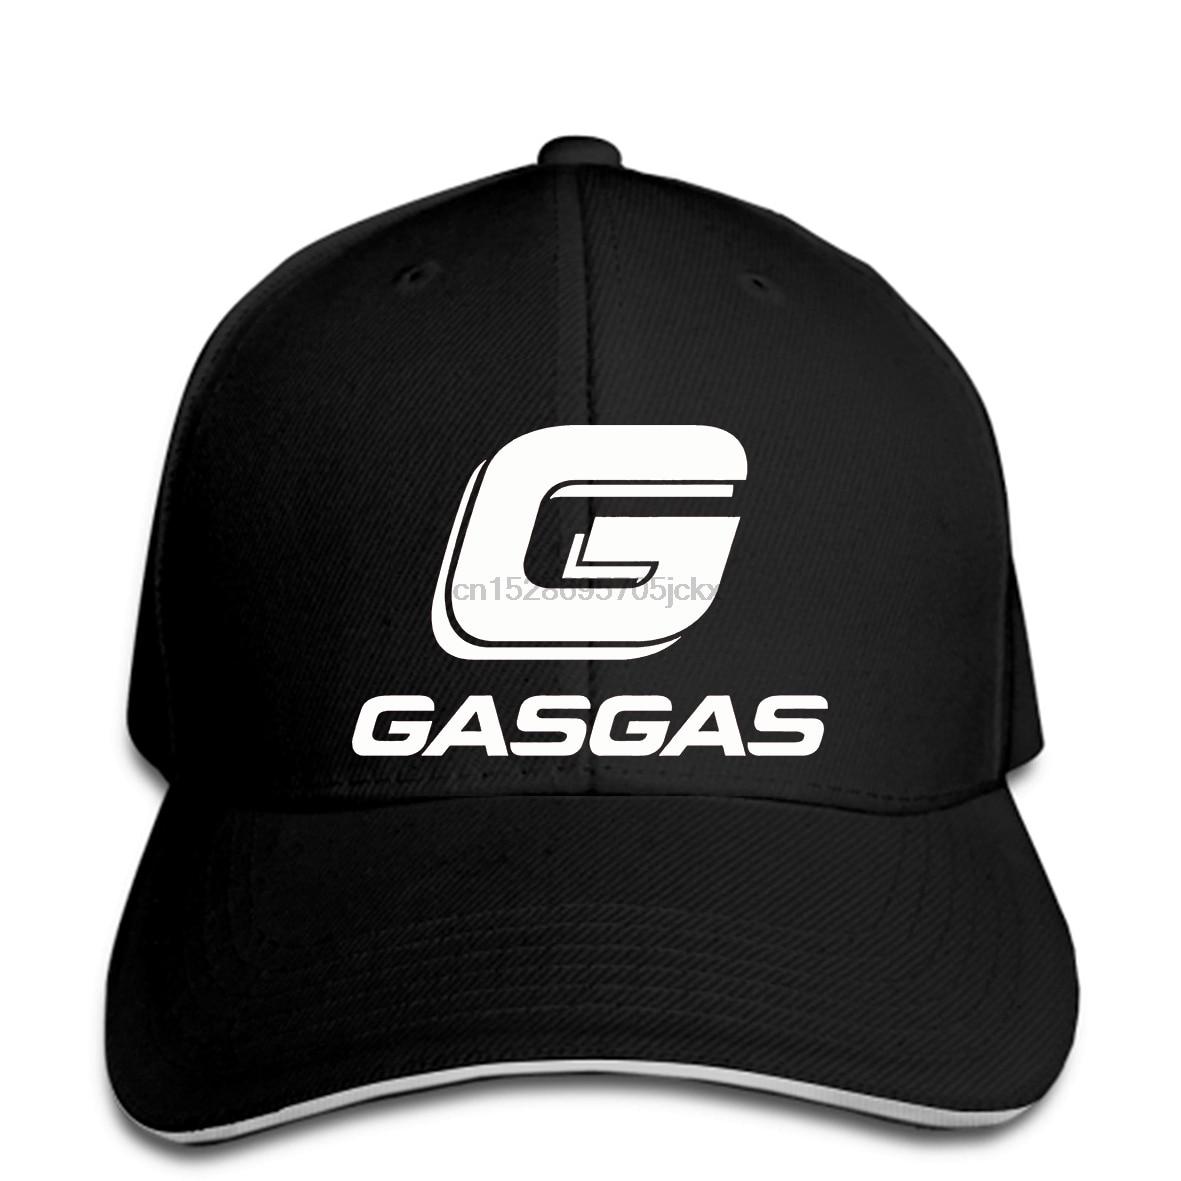 Moda Gasgas Team Factory Racing Trials para moto de Enduro Top gorra de béisbol camiseta _10 snapback sombrero pico